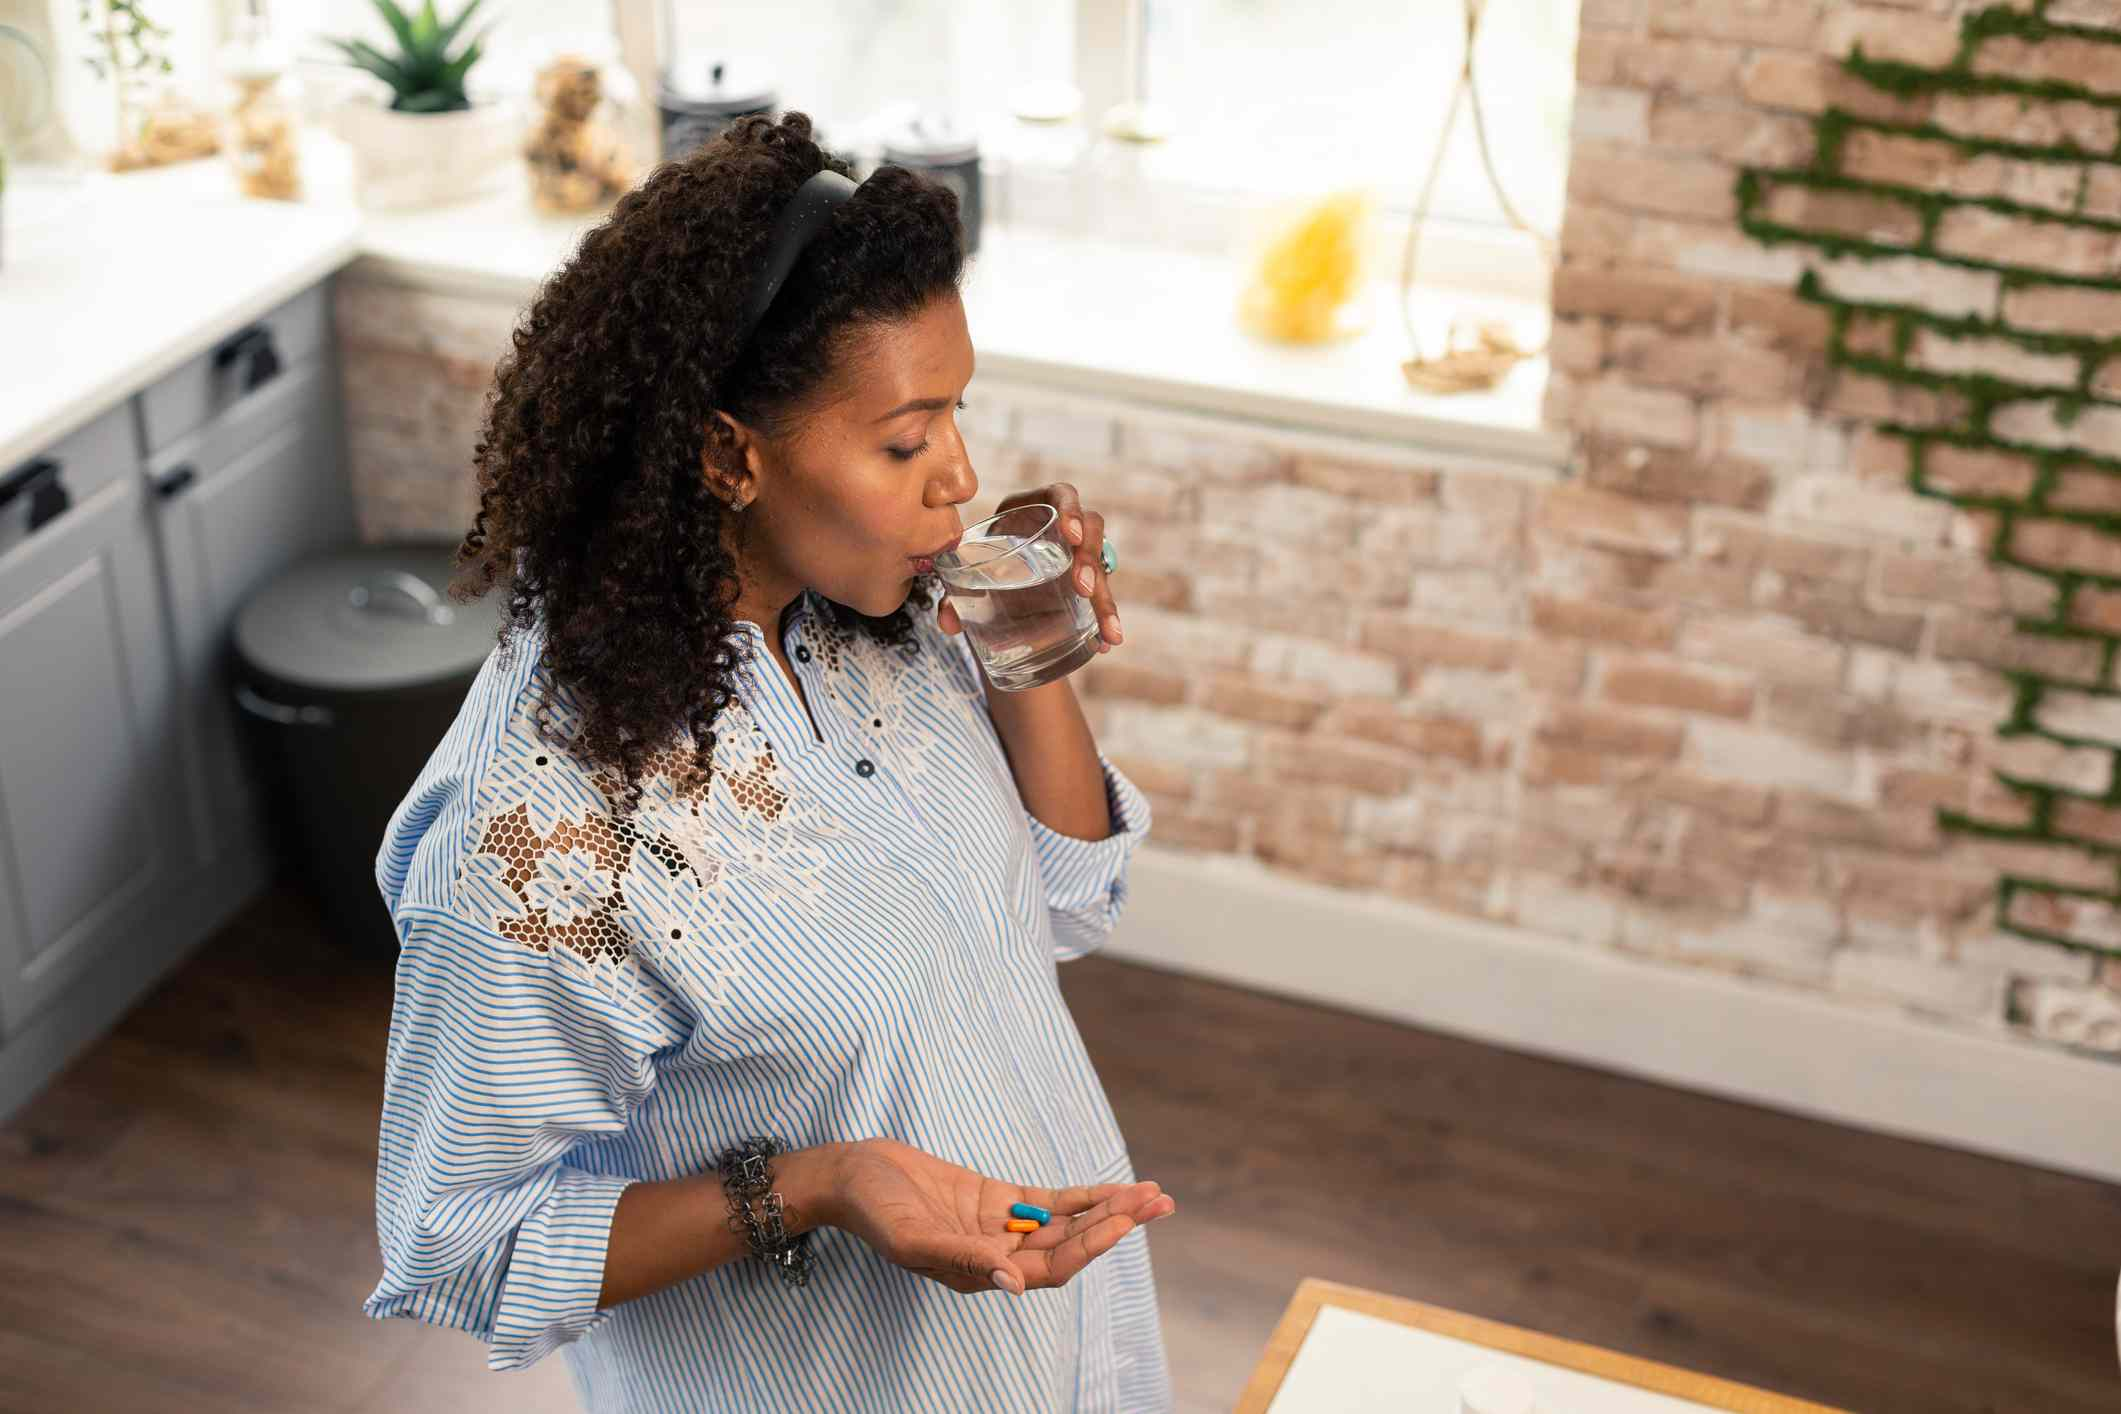 Pregnant person taking prenatal vitamins